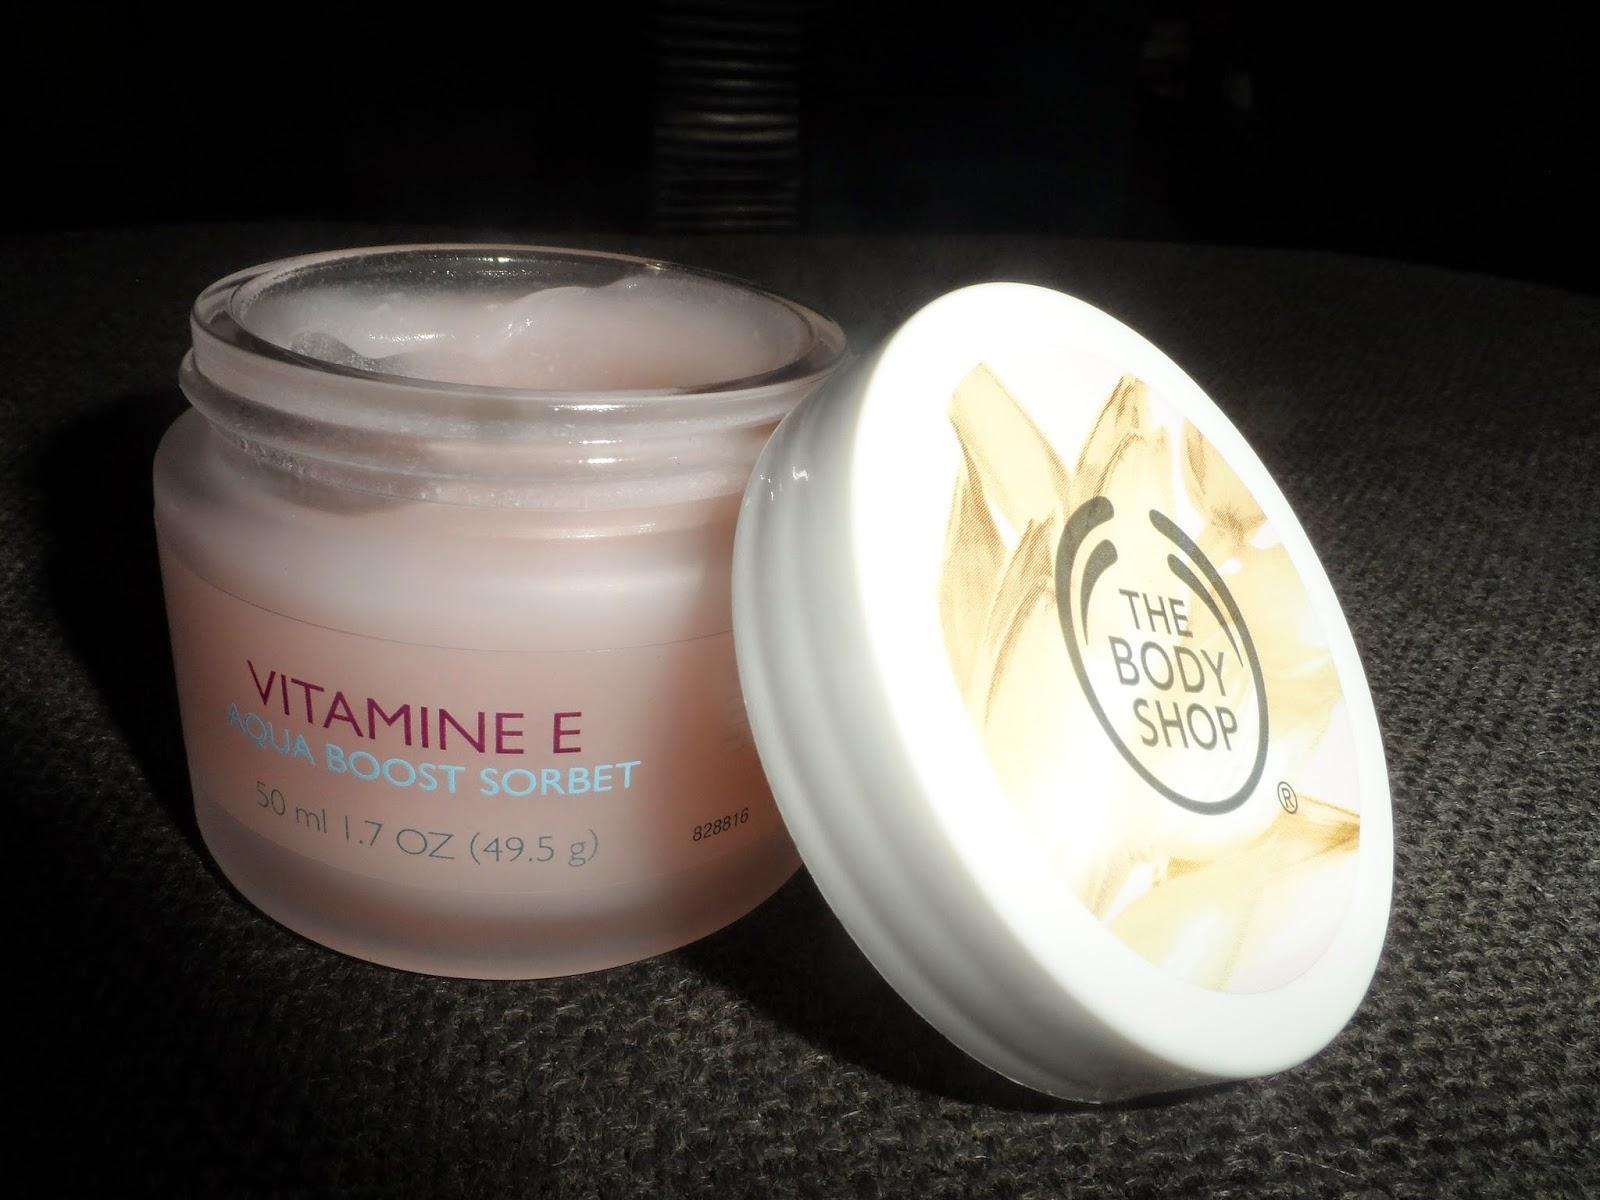 Vitamin E Aqua Boost Sorbet Body Shop Cool Skin Treat